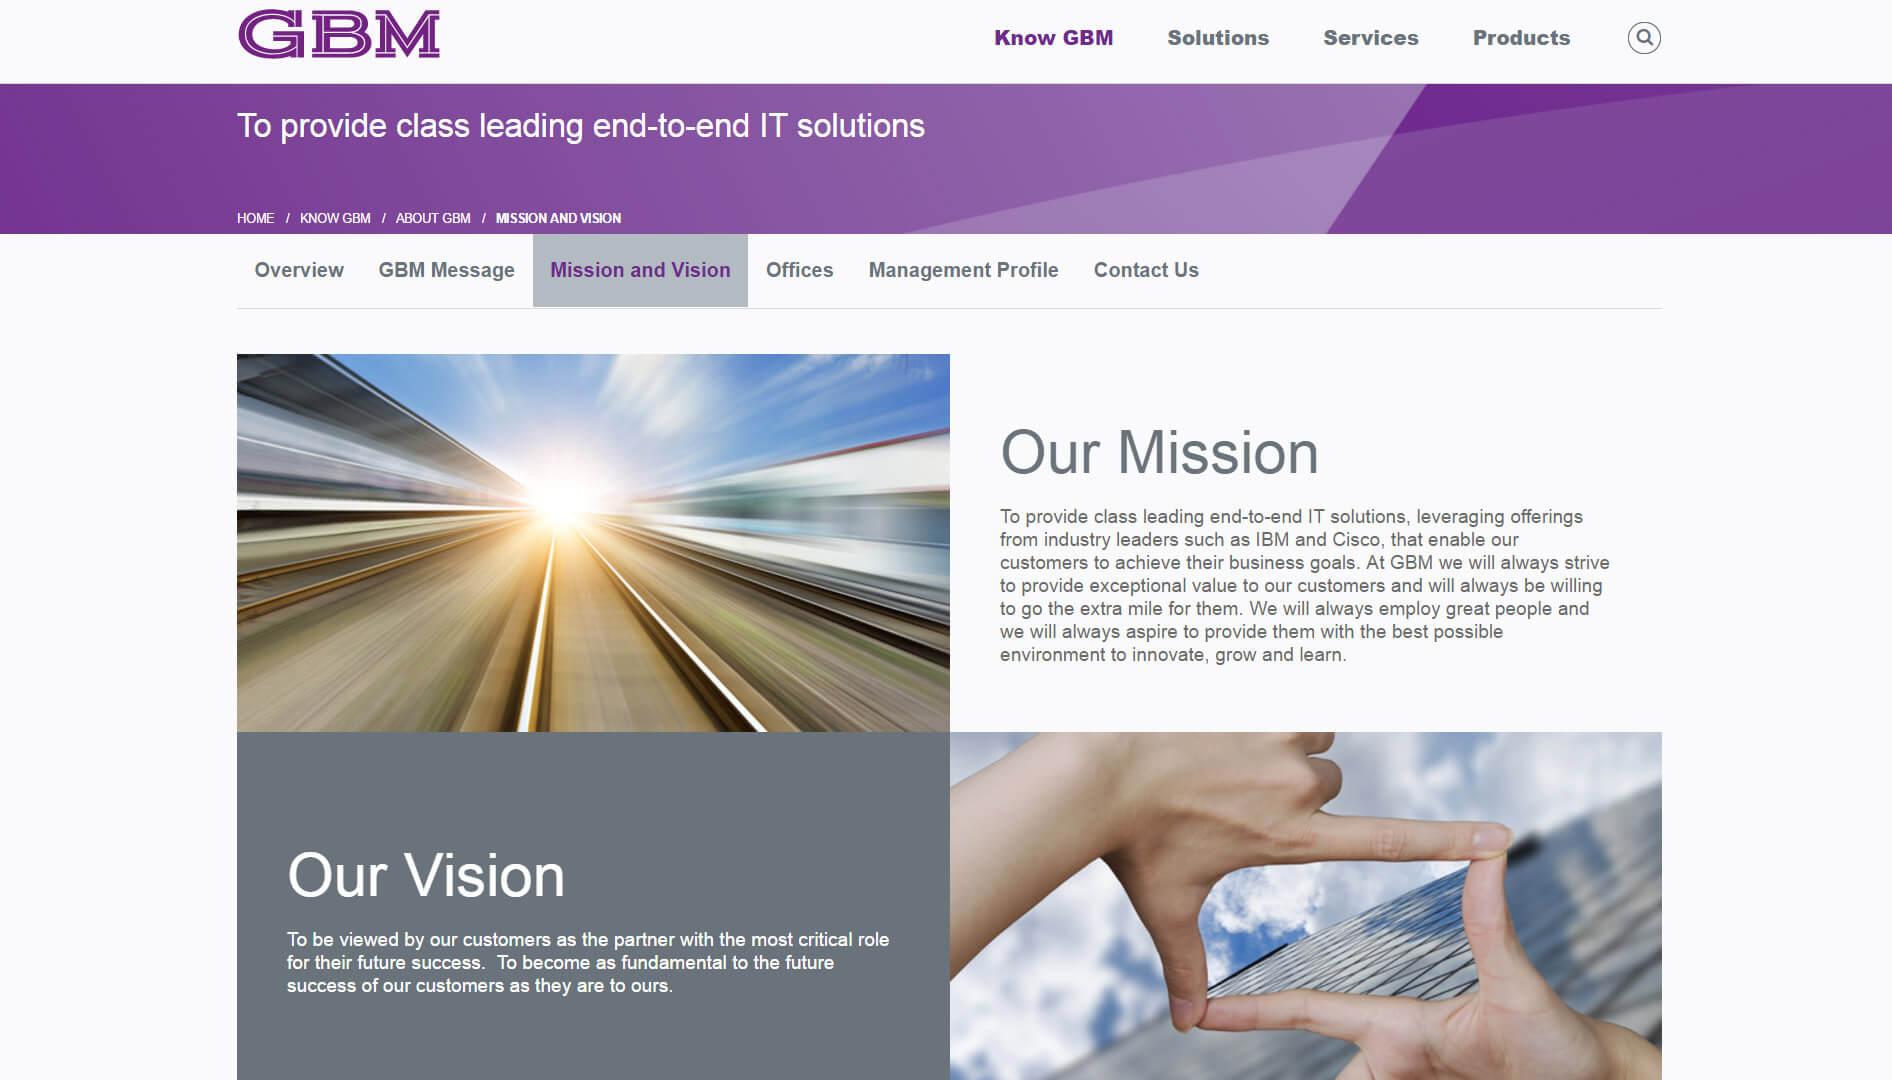 gbm mission page design